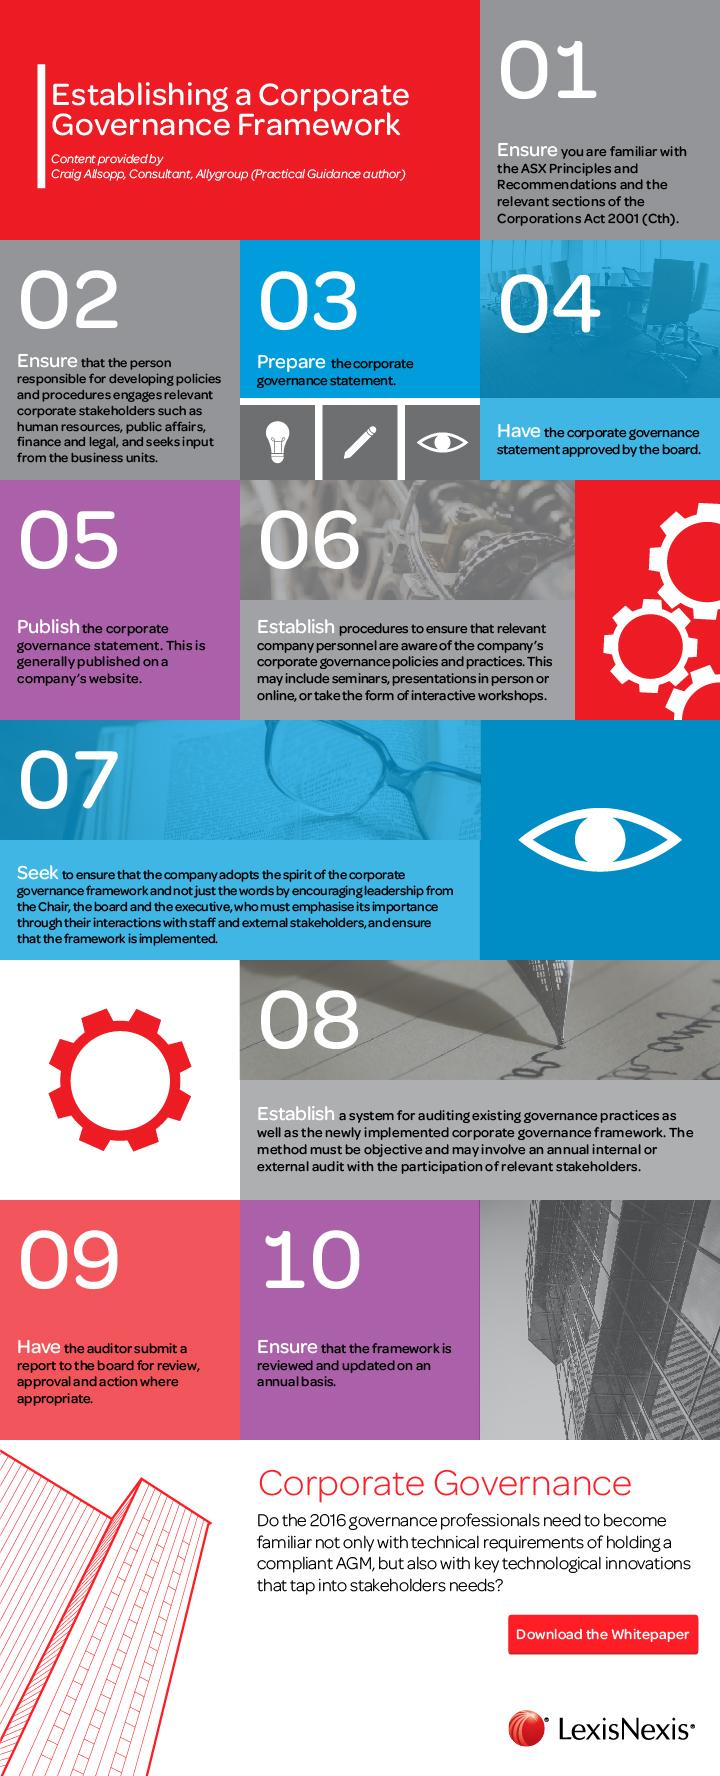 Establishing A Seasonal Capsule Part 1: Establishing A Corporate Governance Framework (infographic